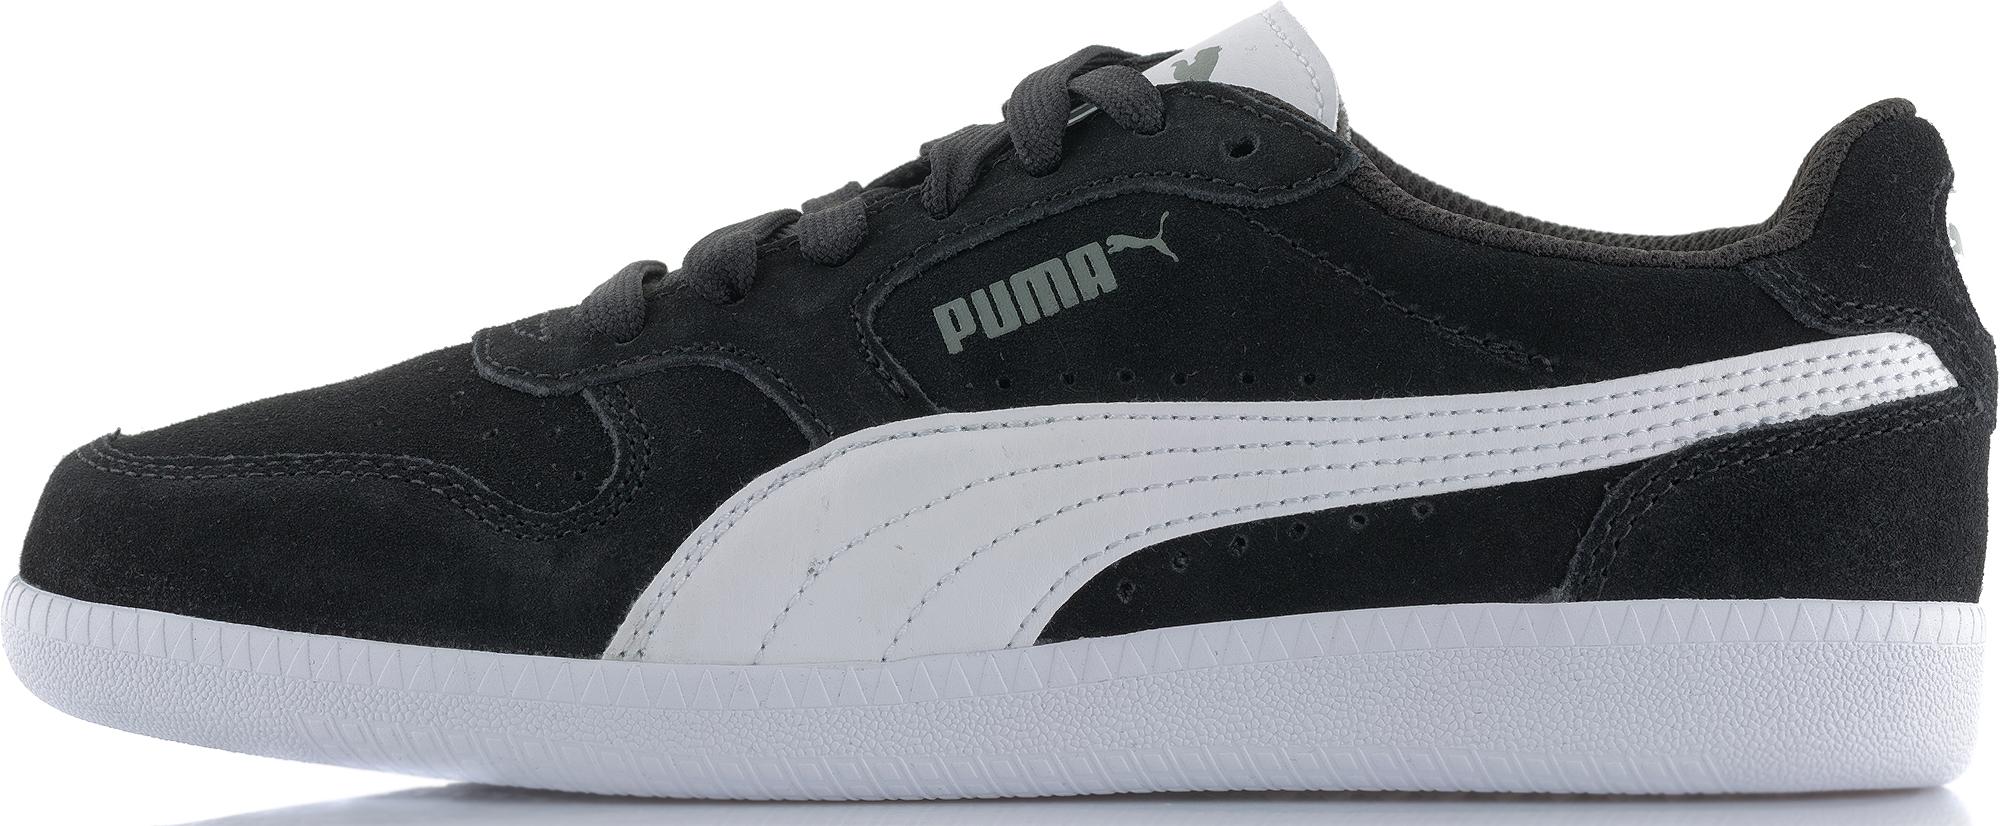 Puma Кеды для мальчиков Puma Icra Trainer Sd, размер 38 цены онлайн